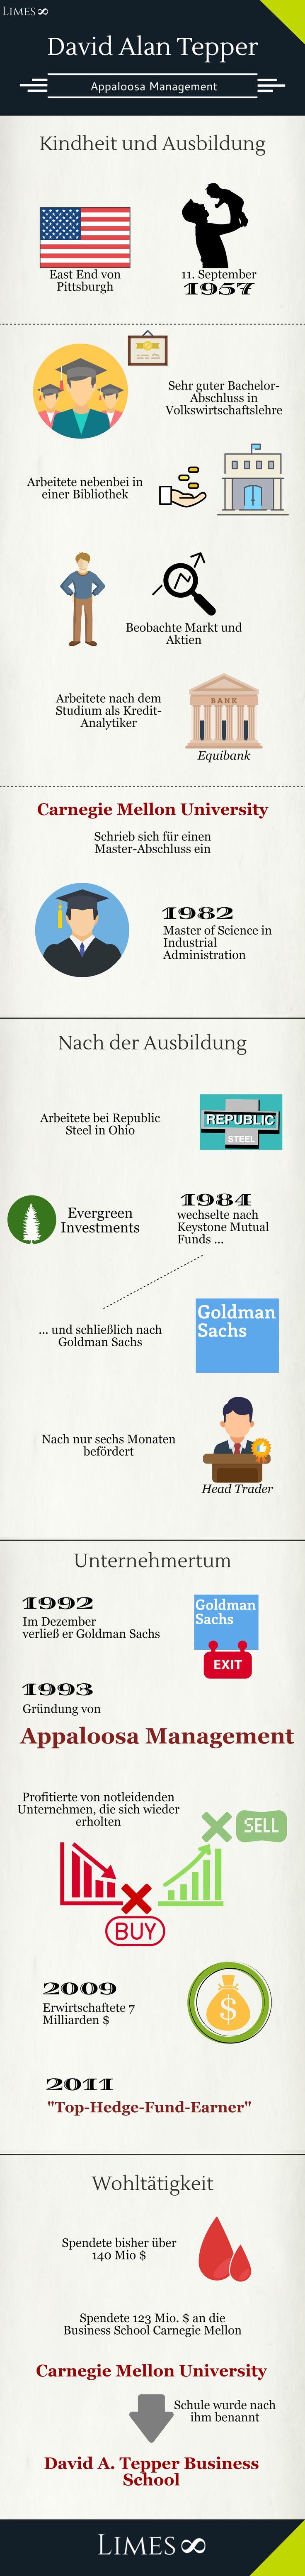 Infografik David Tepper: Präsident von Appaloosa Management. Top-Hedge-Fund-Earner 2011.